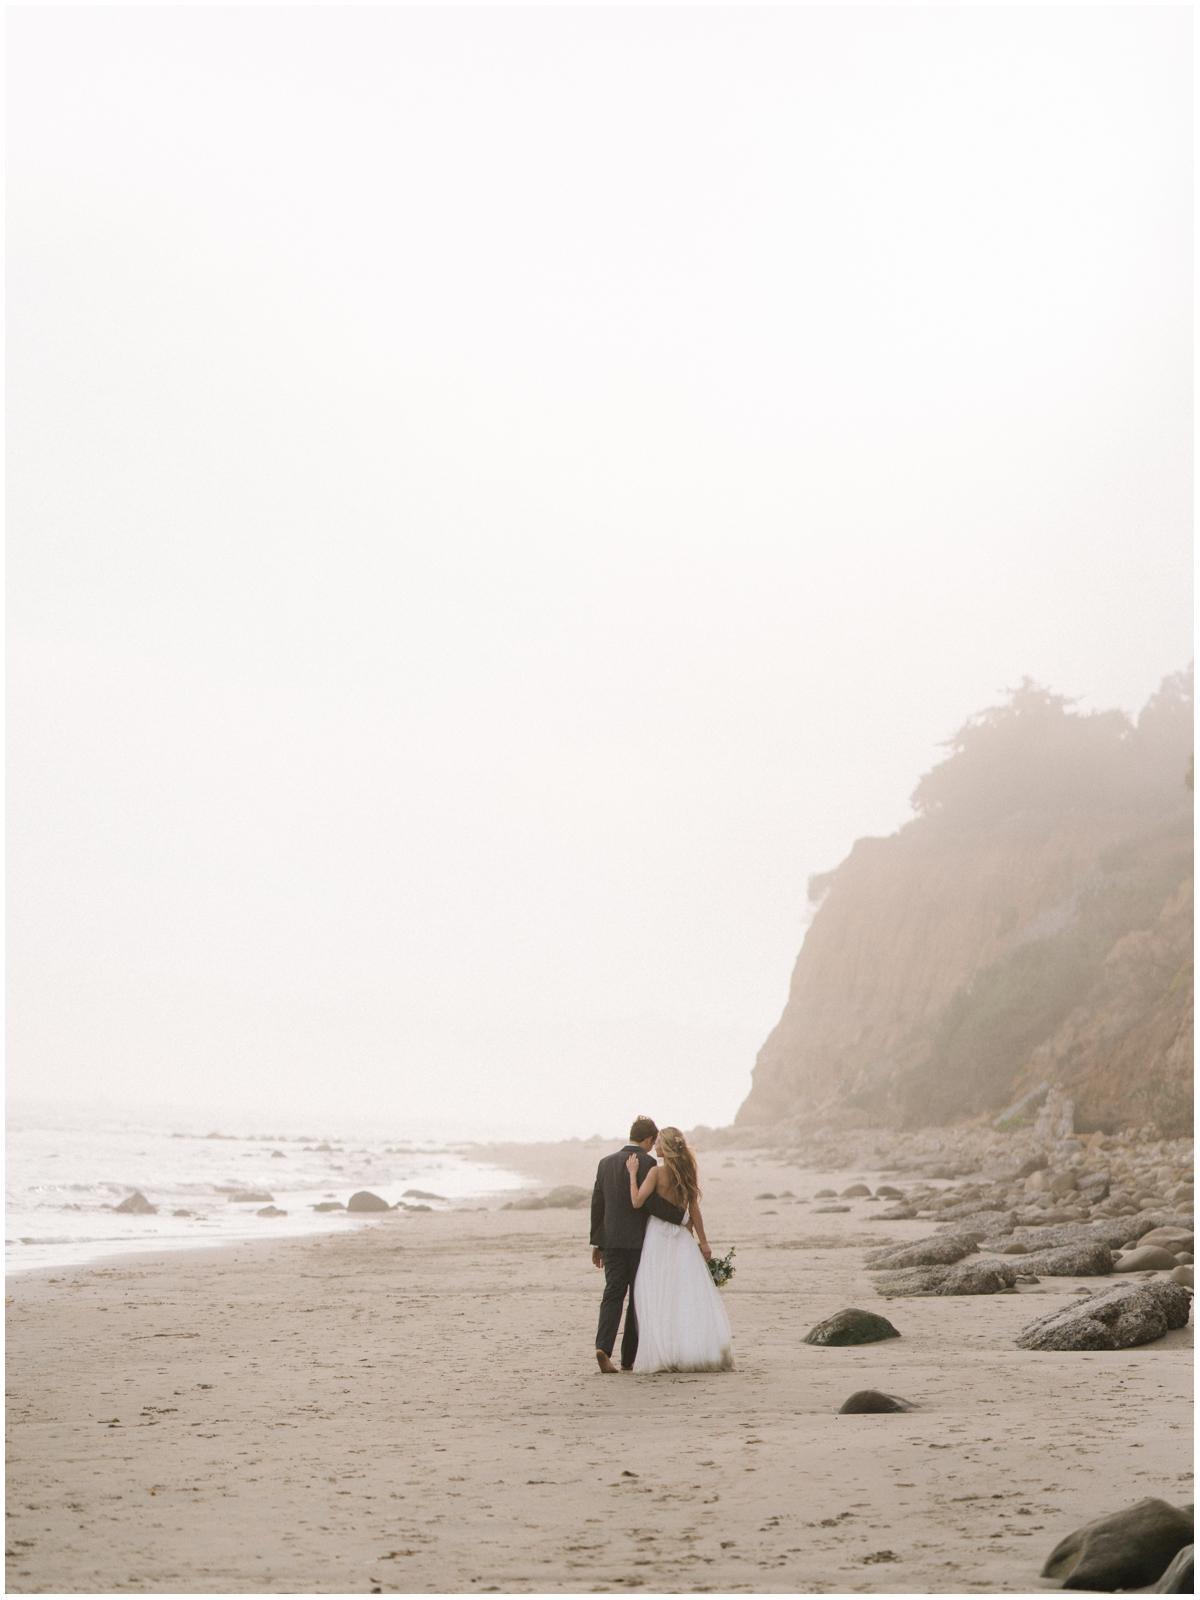 Santa Babara Elopement Wedding Photographer - Pinnel Photography-01-24.jpg